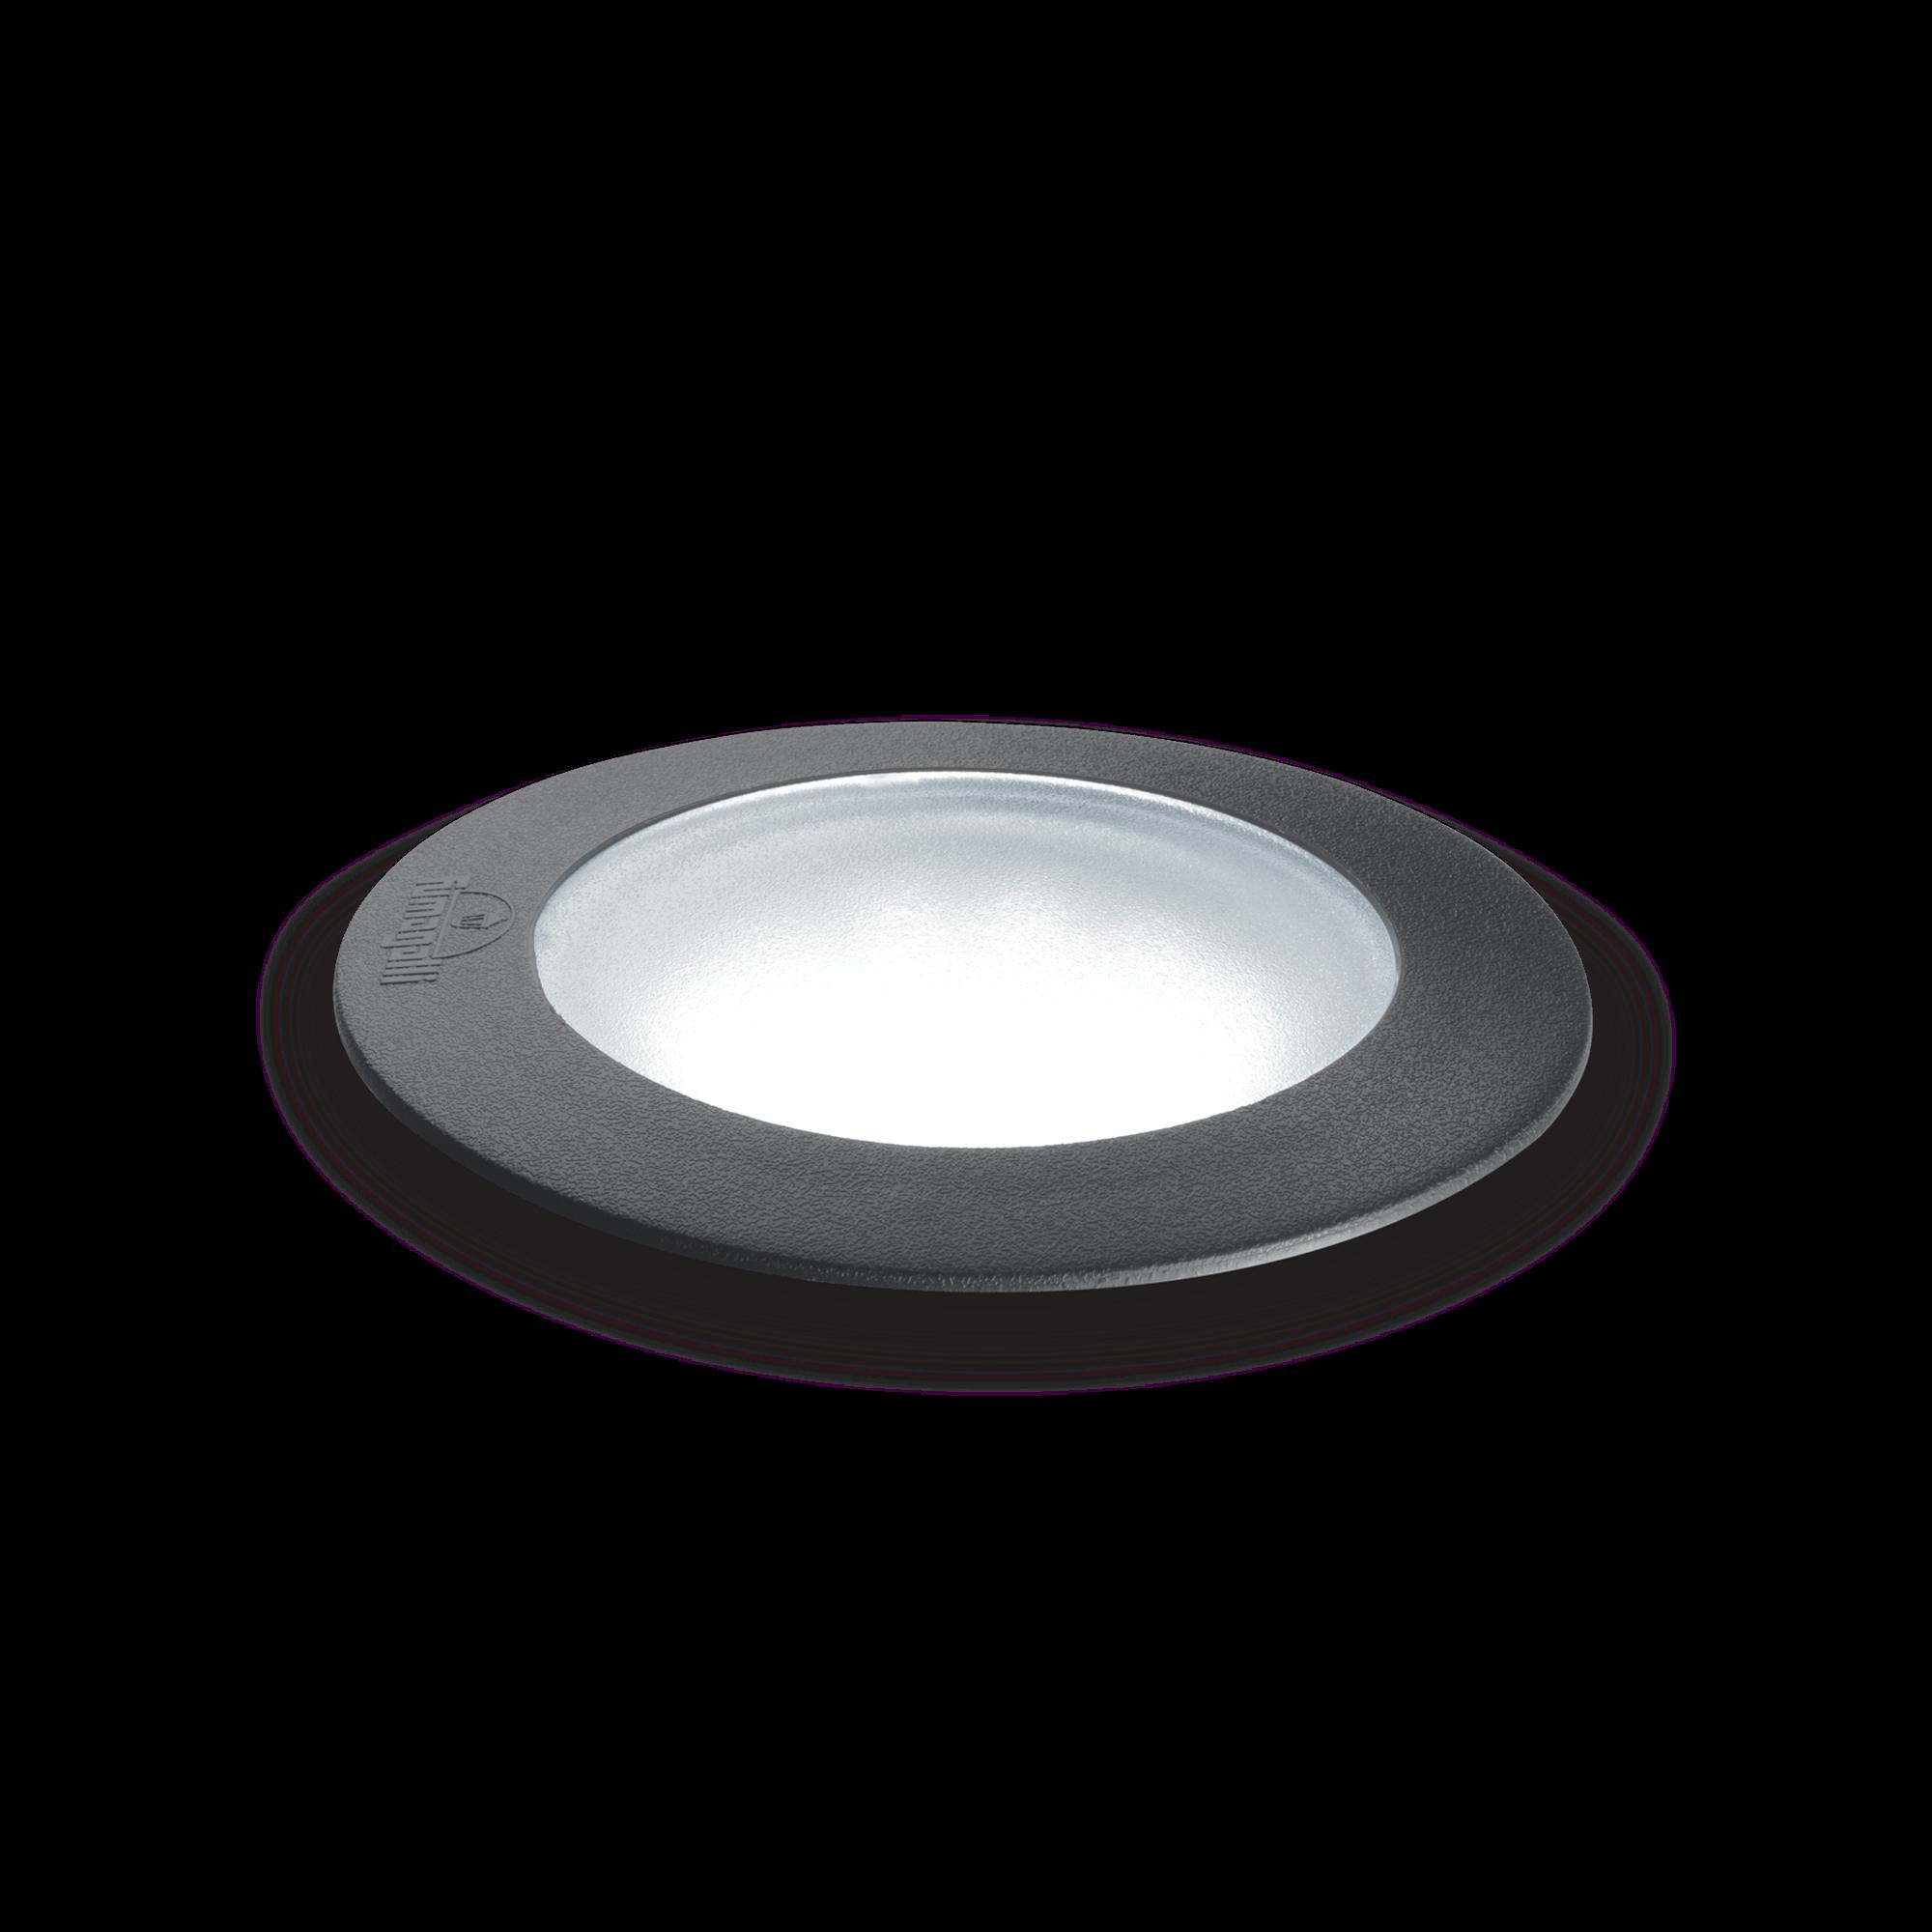 Exteriérové zápustné svítidlo Ideal lux 120249 CECI PT1 ROUND SMALL 1xGU10 6W 4000K IP67